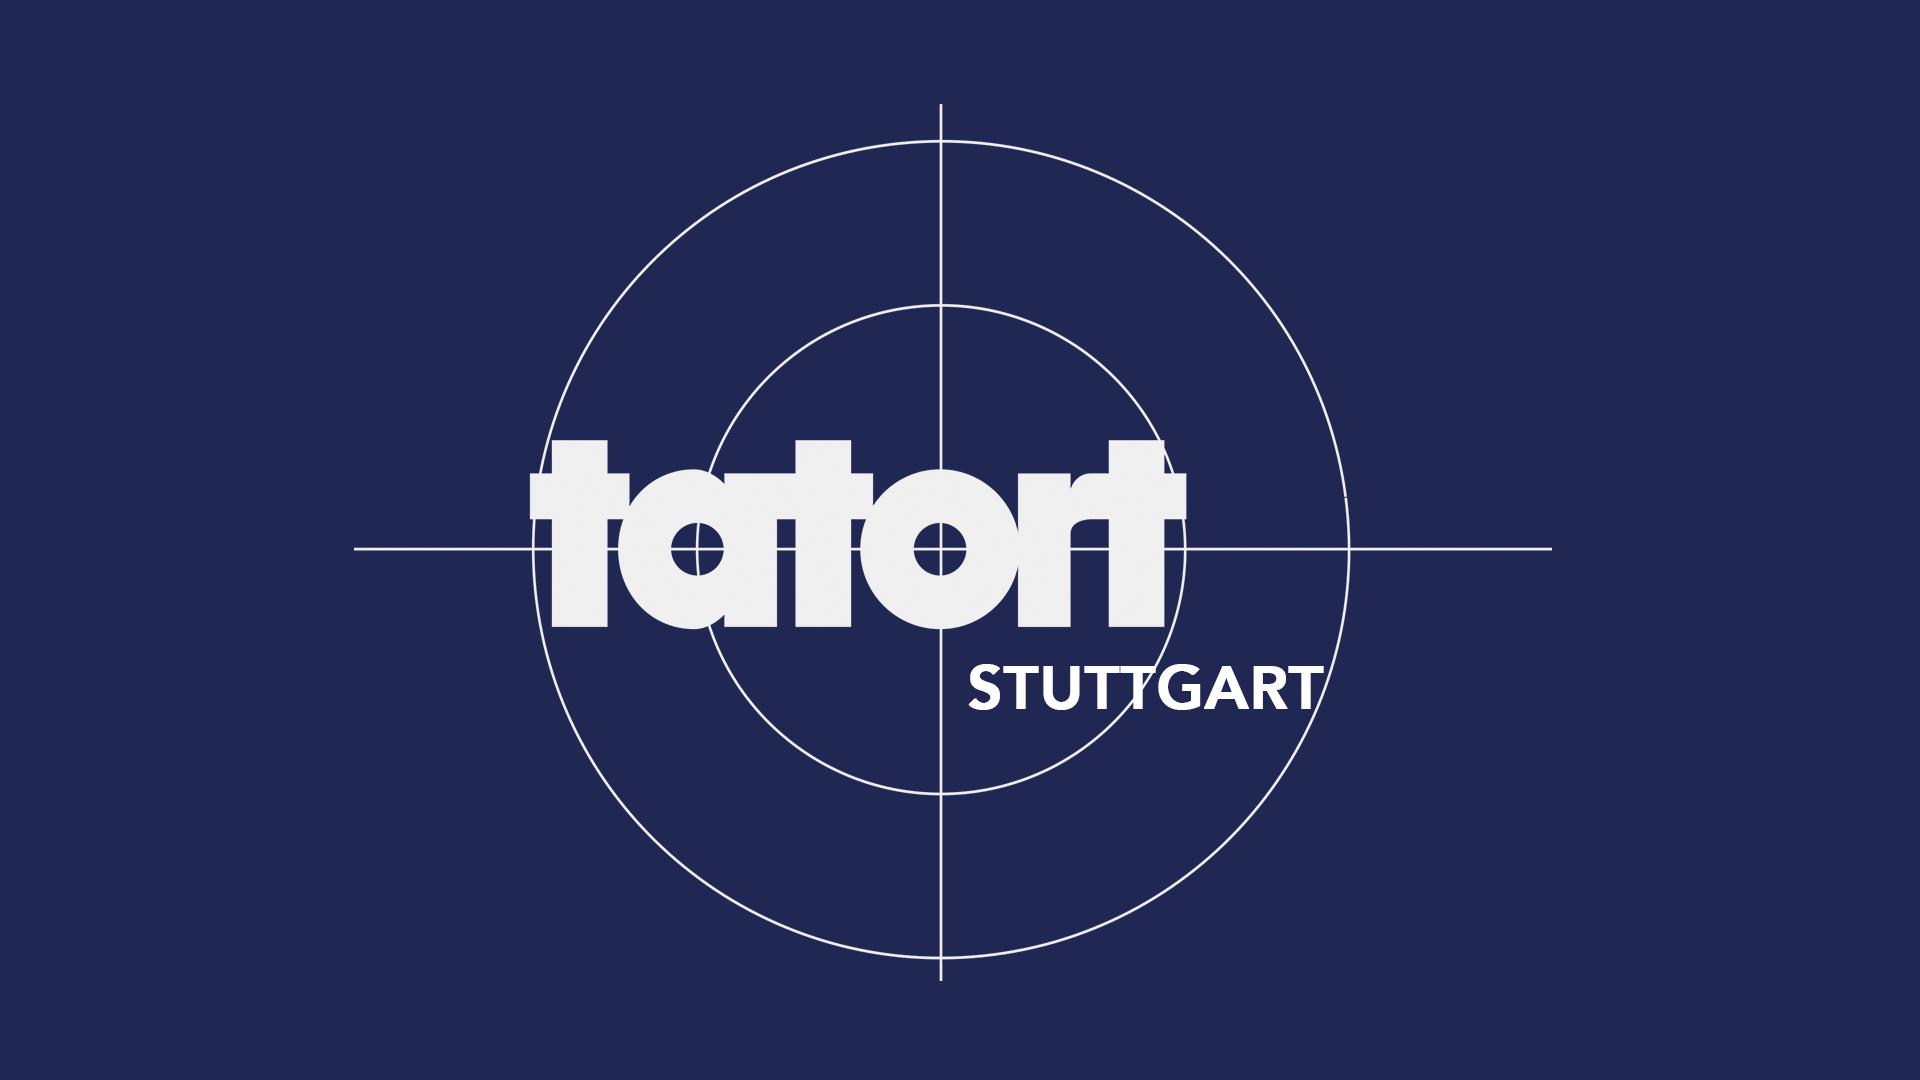 TATORT STUTTGART - Stau